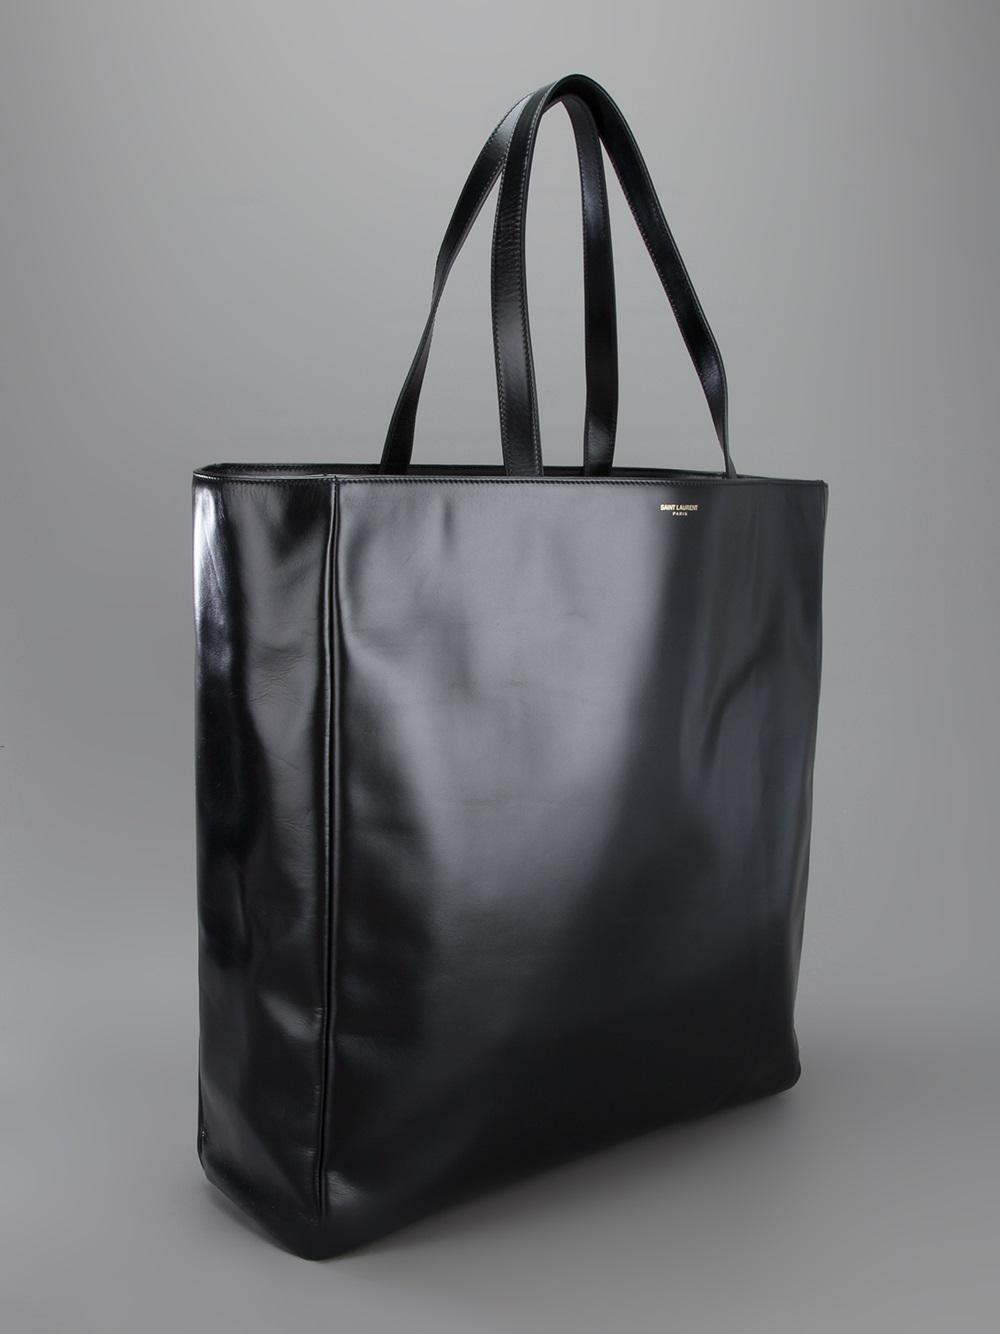 fb469ac23f24 Lyst - Saint Laurent Classic Shopper Tote in Black for Men